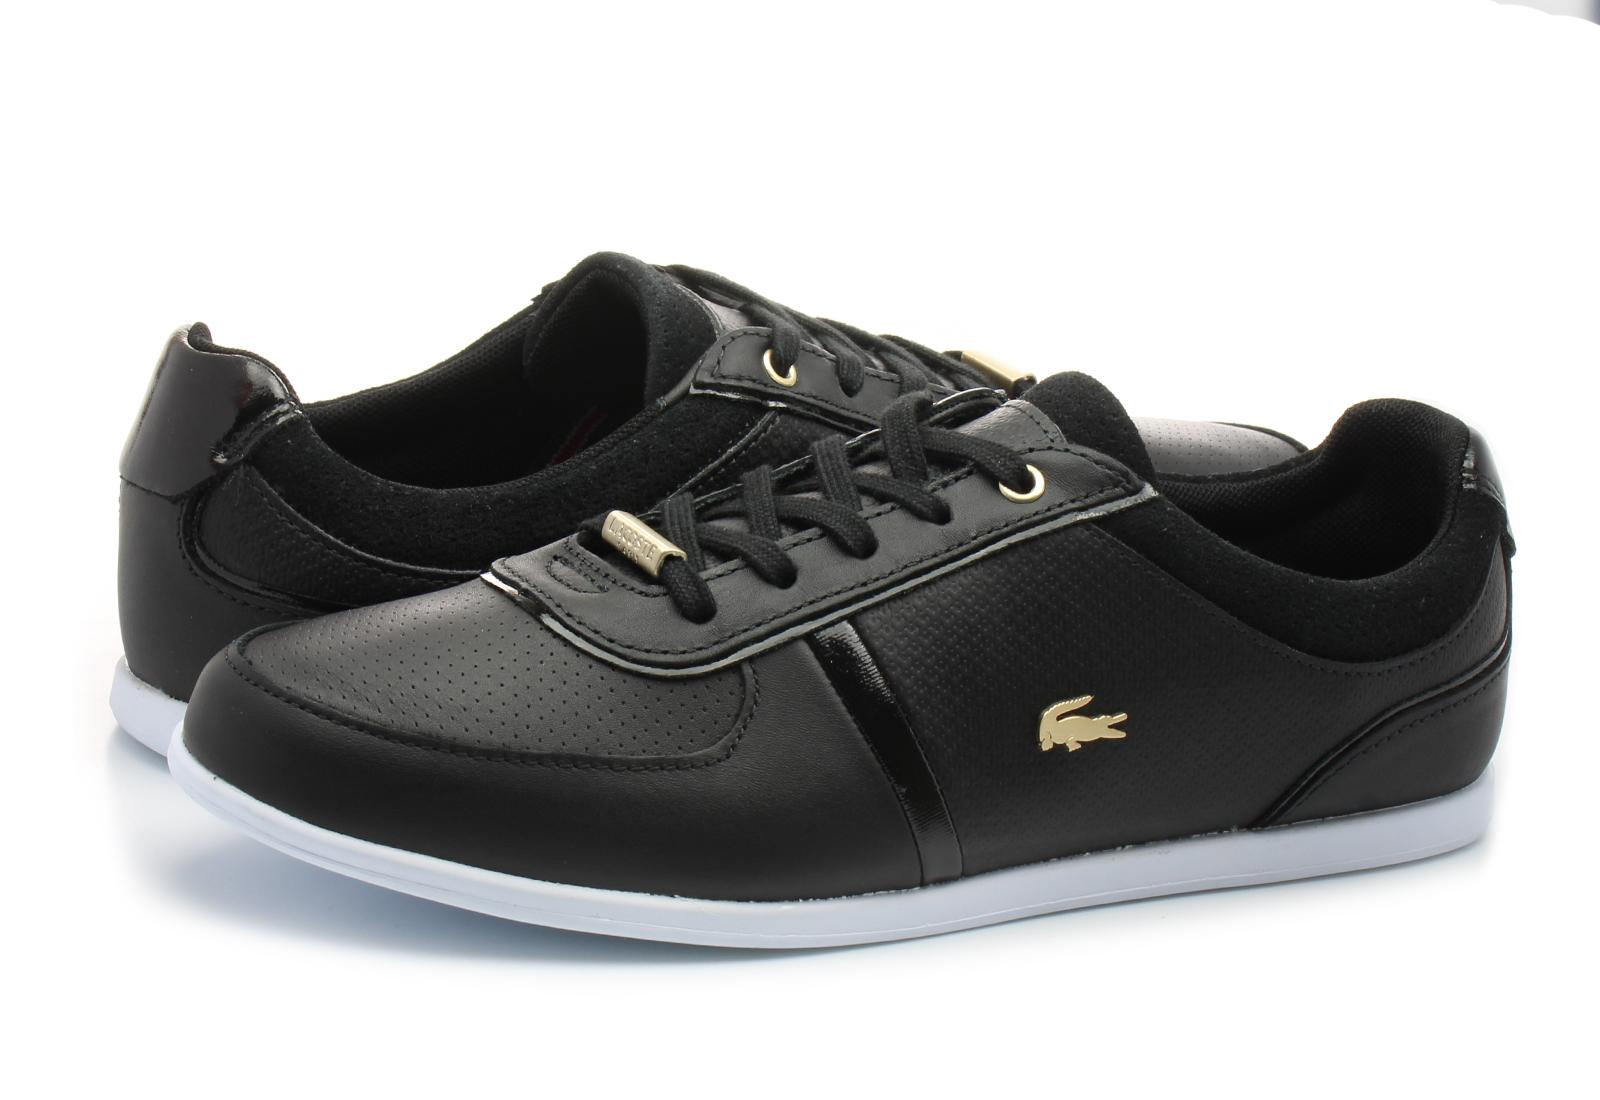 d7ffd2911928 Lacoste Shoes - Rey U Throat 118 1 - 181caw0061-312 - Online shop ...